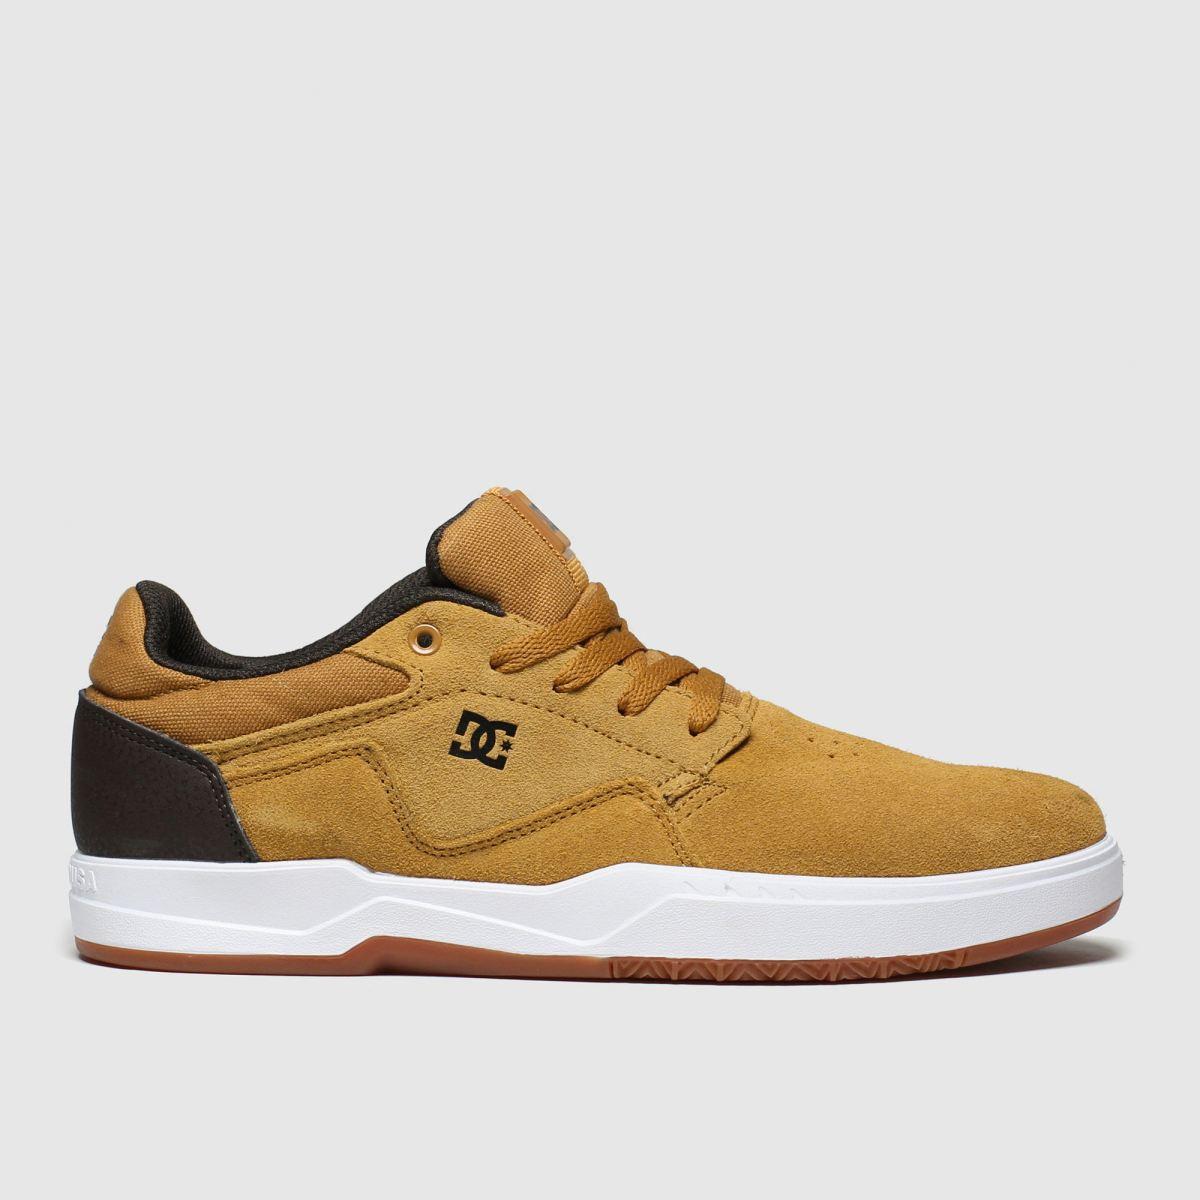 dc shoes Dc Shoes Tan Barksdale Trainers